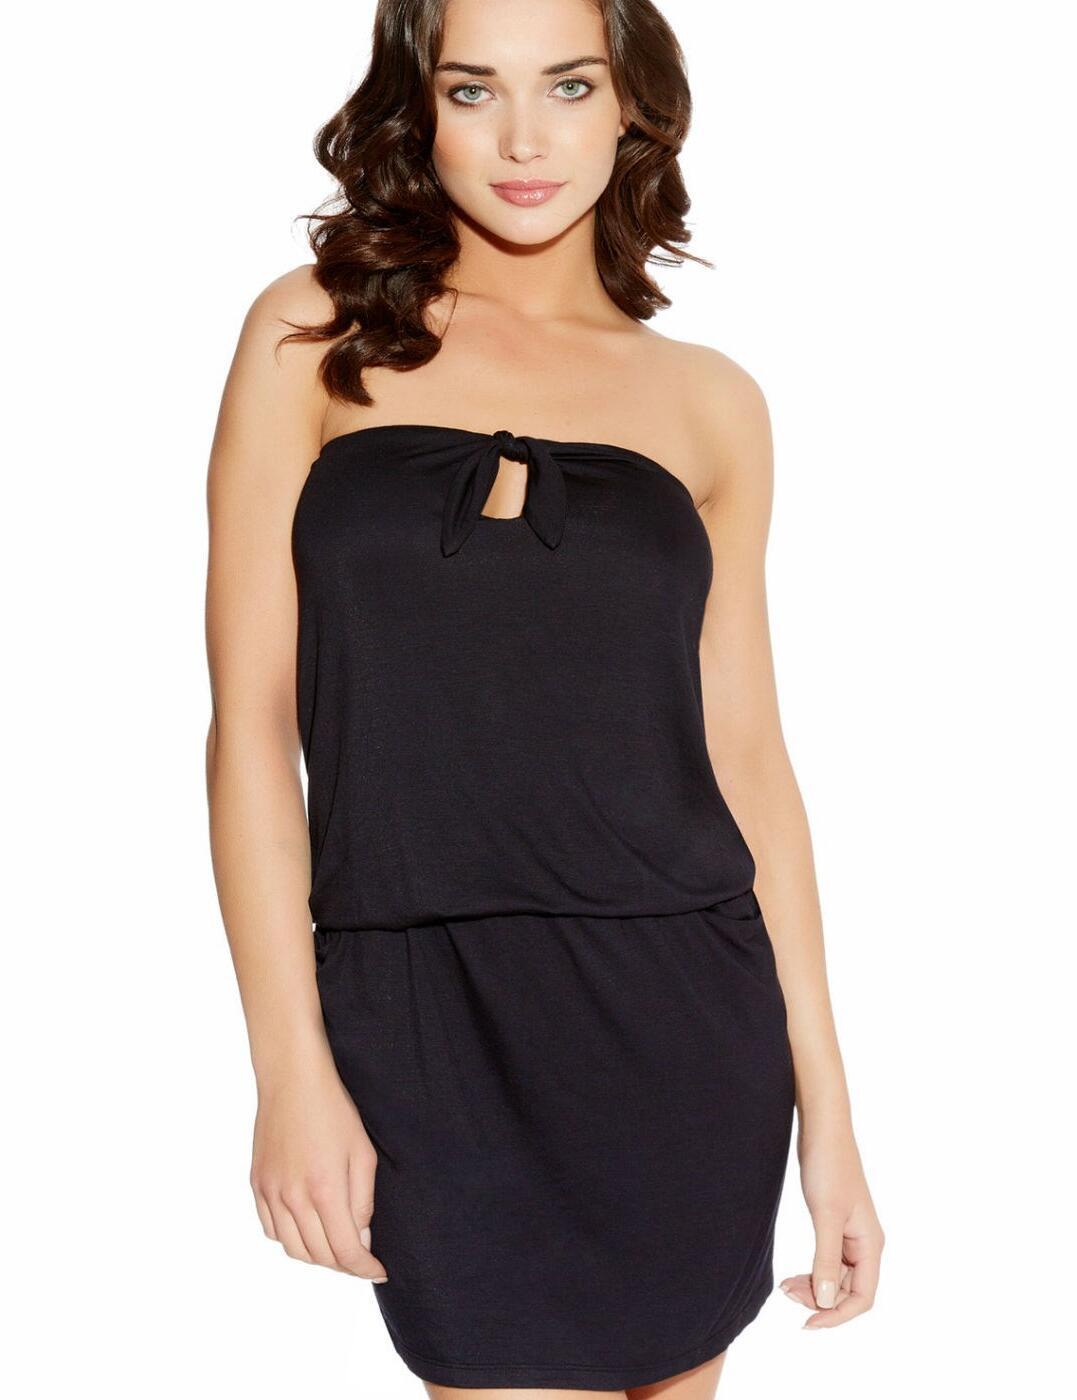 3620 Freya Poppy Bandeau Tie Front Beach Dress - 3620 Black